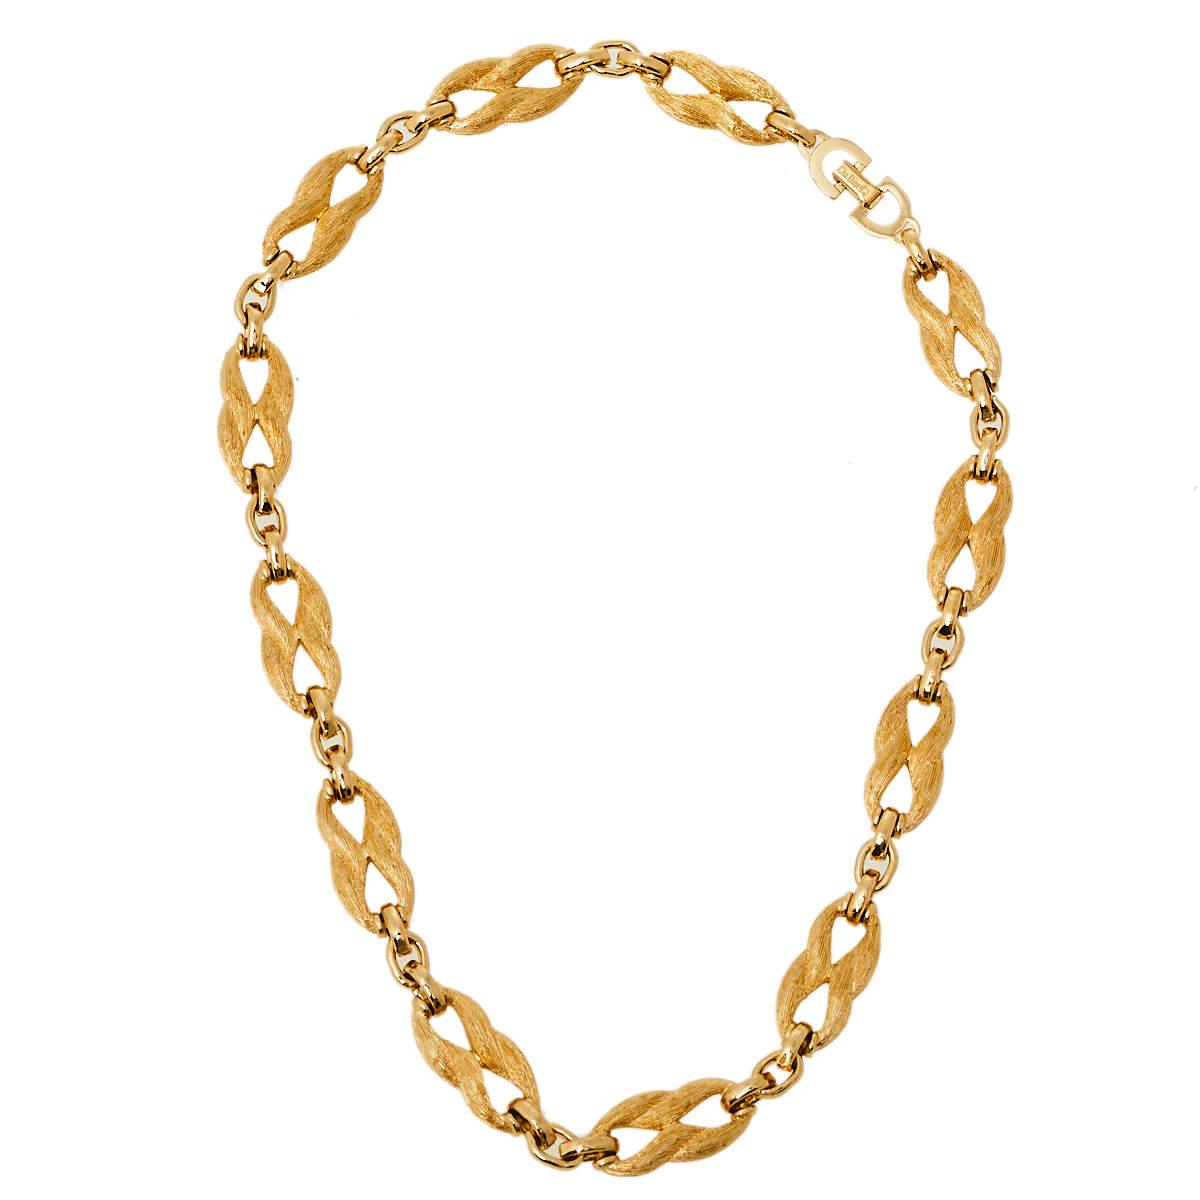 Dior Vintage Brushed Gold Tone Chain Link Necklace